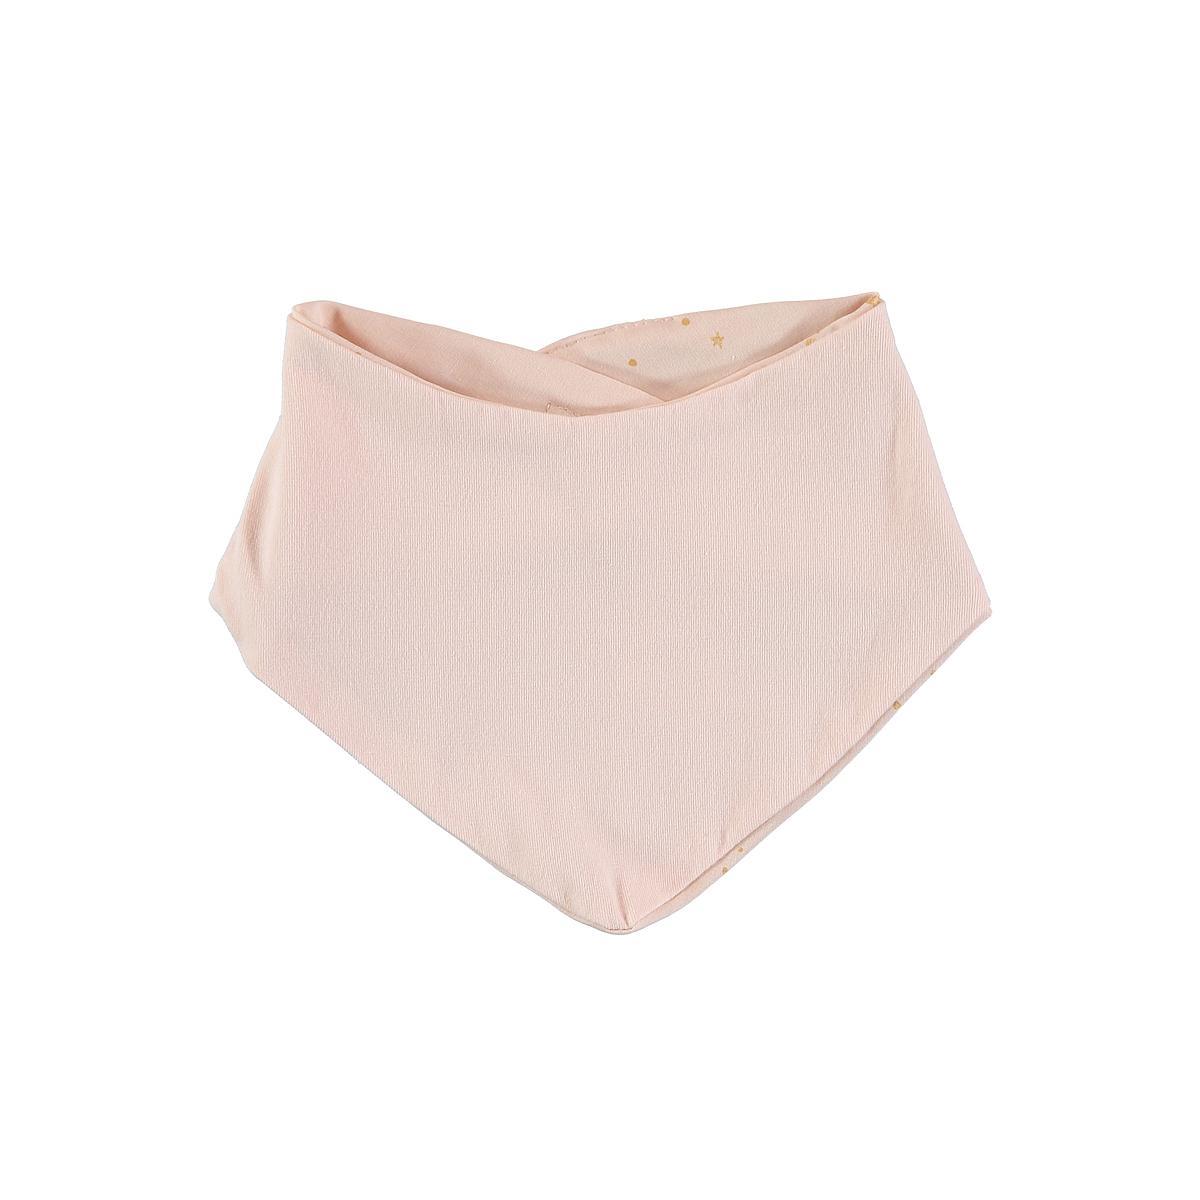 Babero bandana LUCKY ELEMENTS Nobodinoz gold stella-dream pink